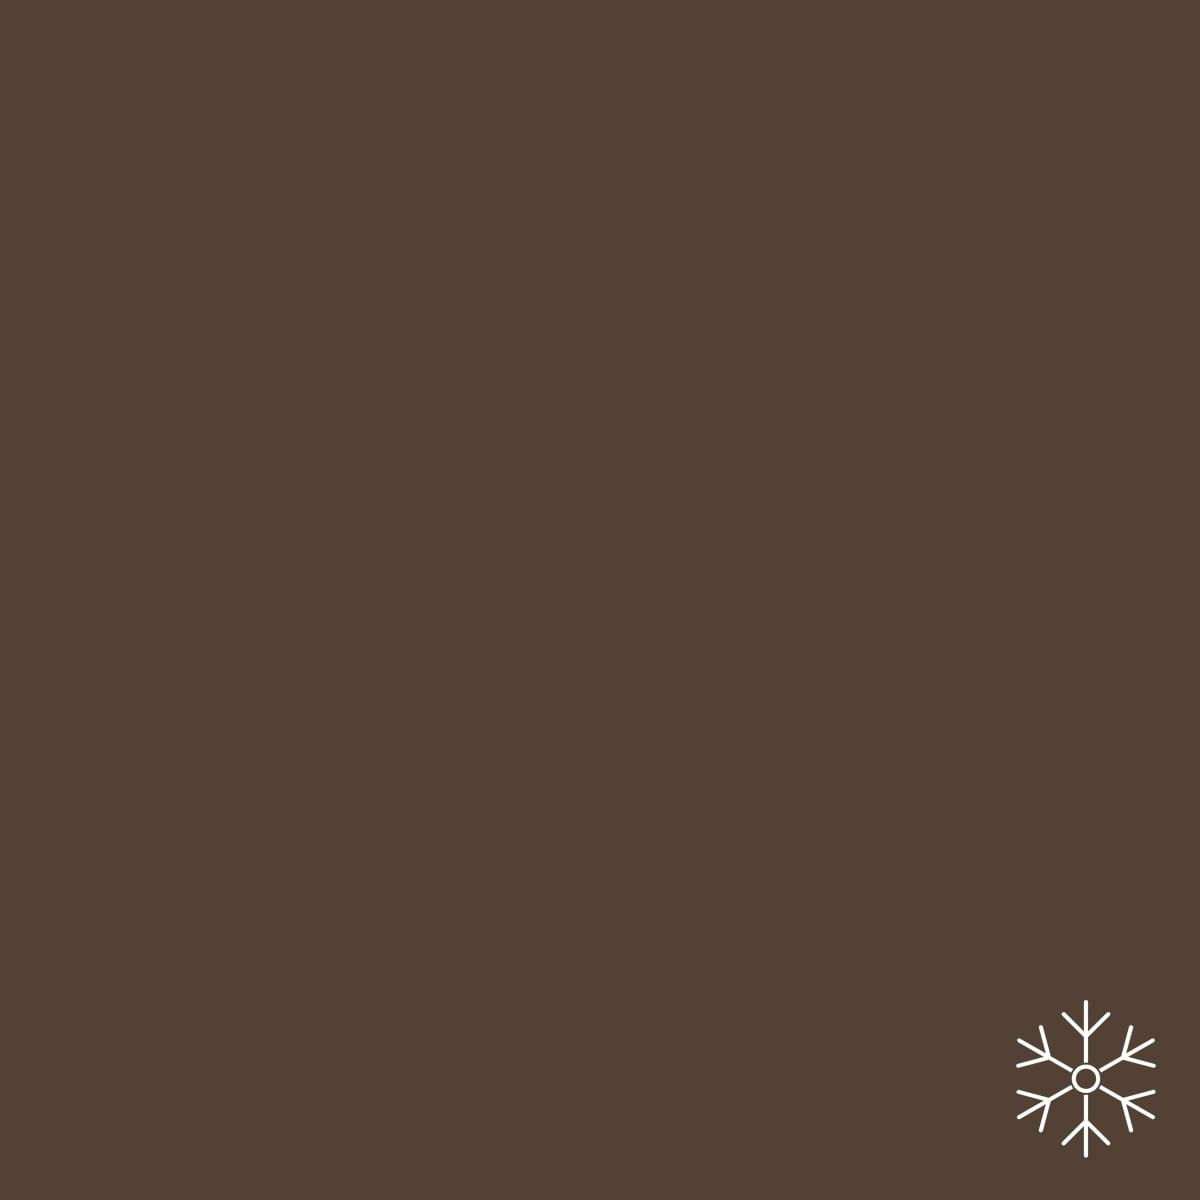 ORGANIC LINE (5ml)  - PIGMENT DARK CHOCOLATE ORGANICLINE AMIEA (5 ml)